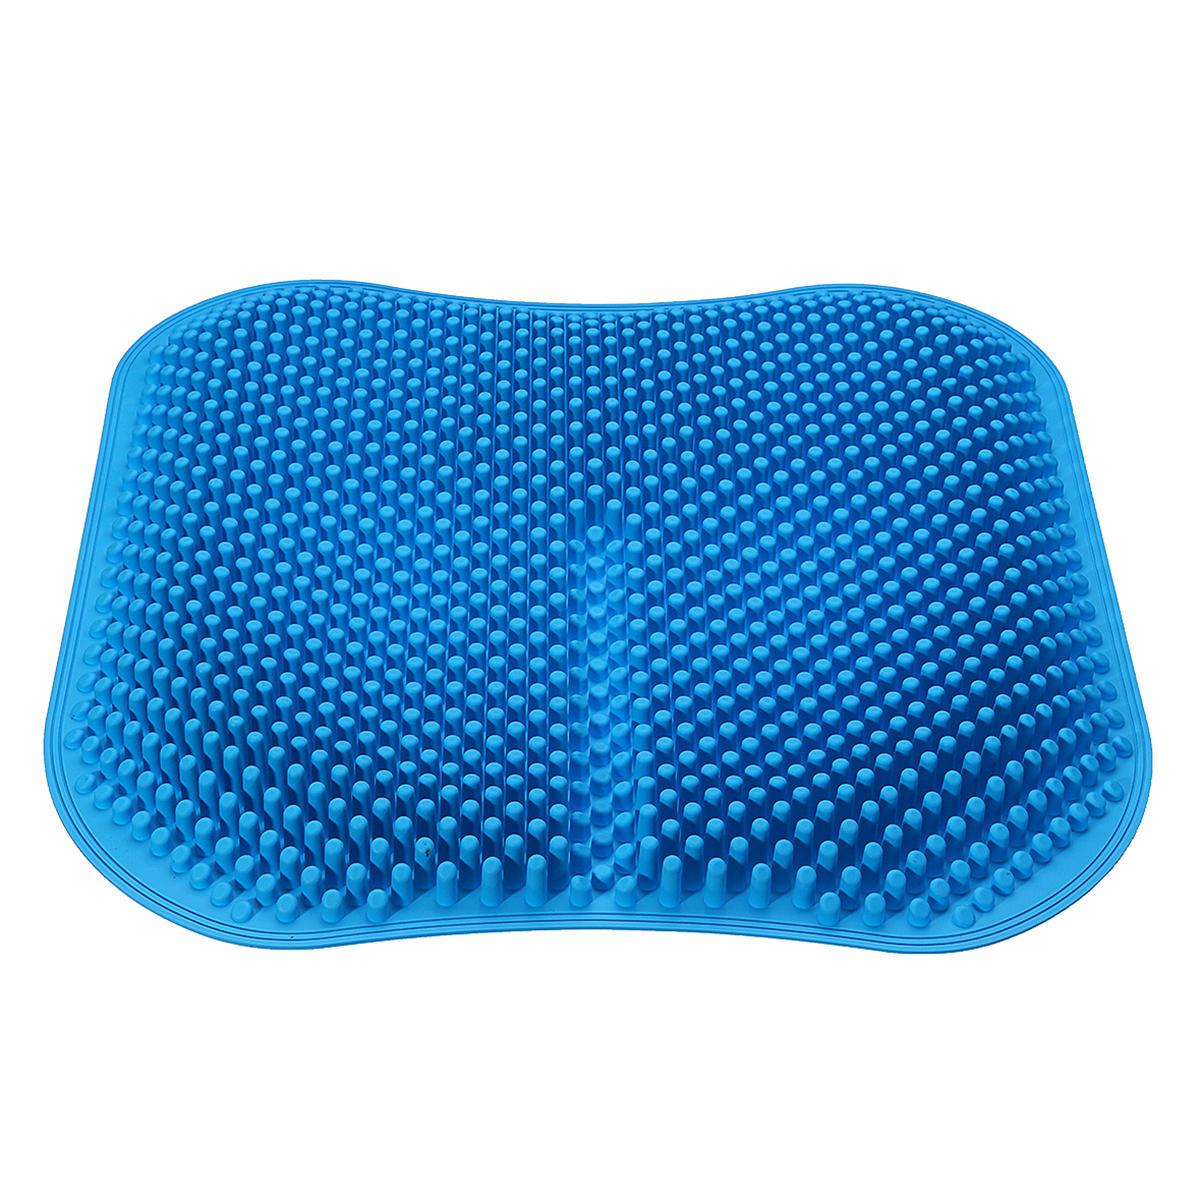 massage chair pad for car glider rocking canada 3d seat cushion silicone mat